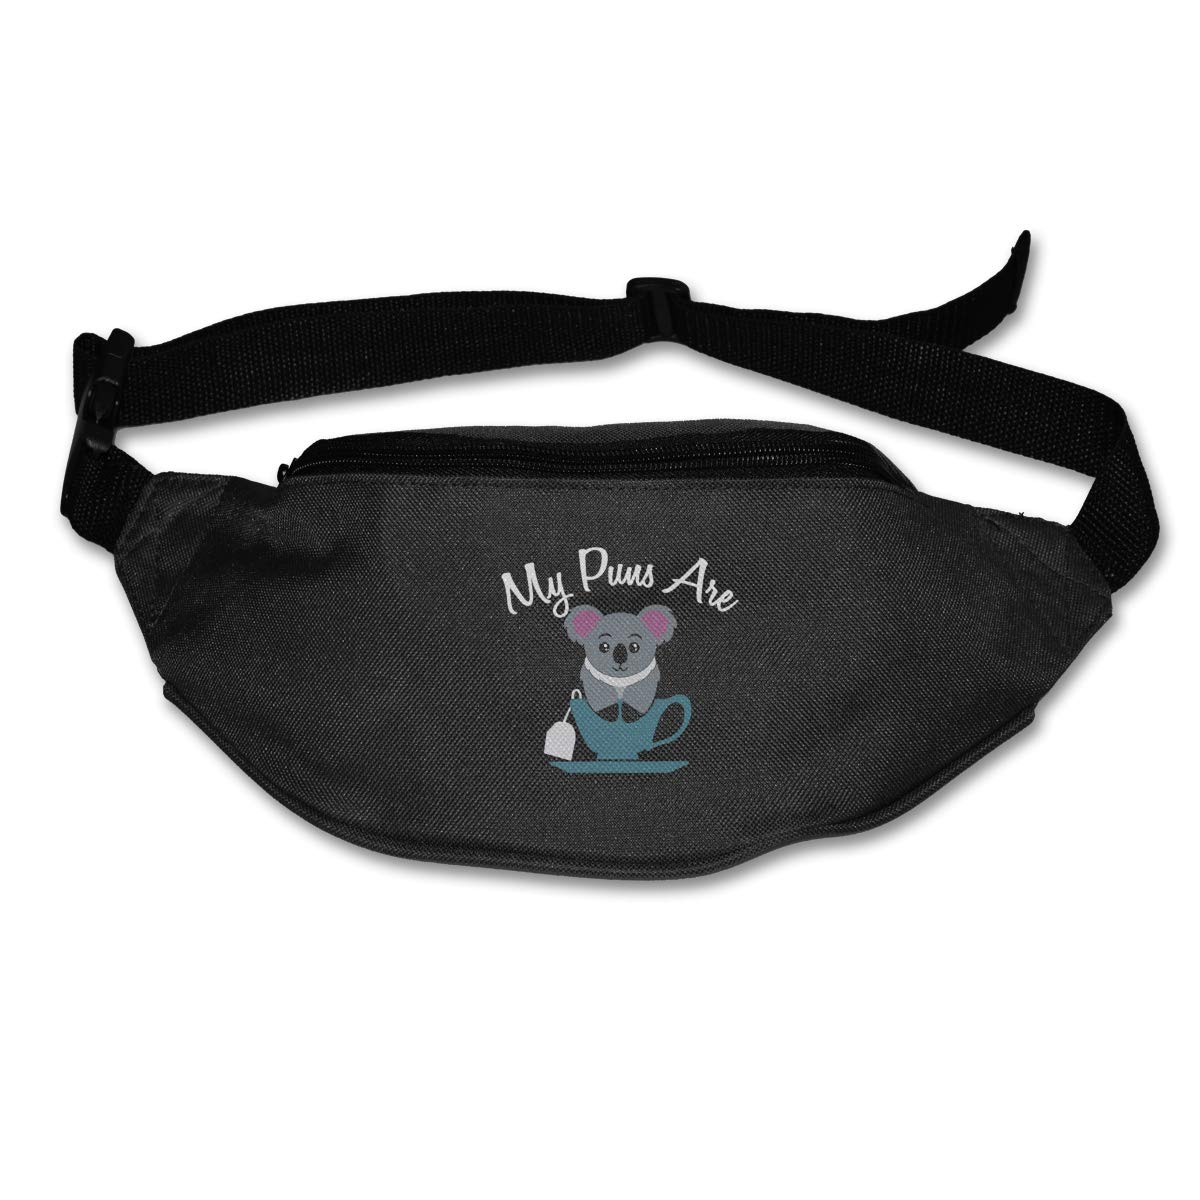 My Pugs Are Koala Sport Waist Bag Fanny Pack Adjustable For Travel